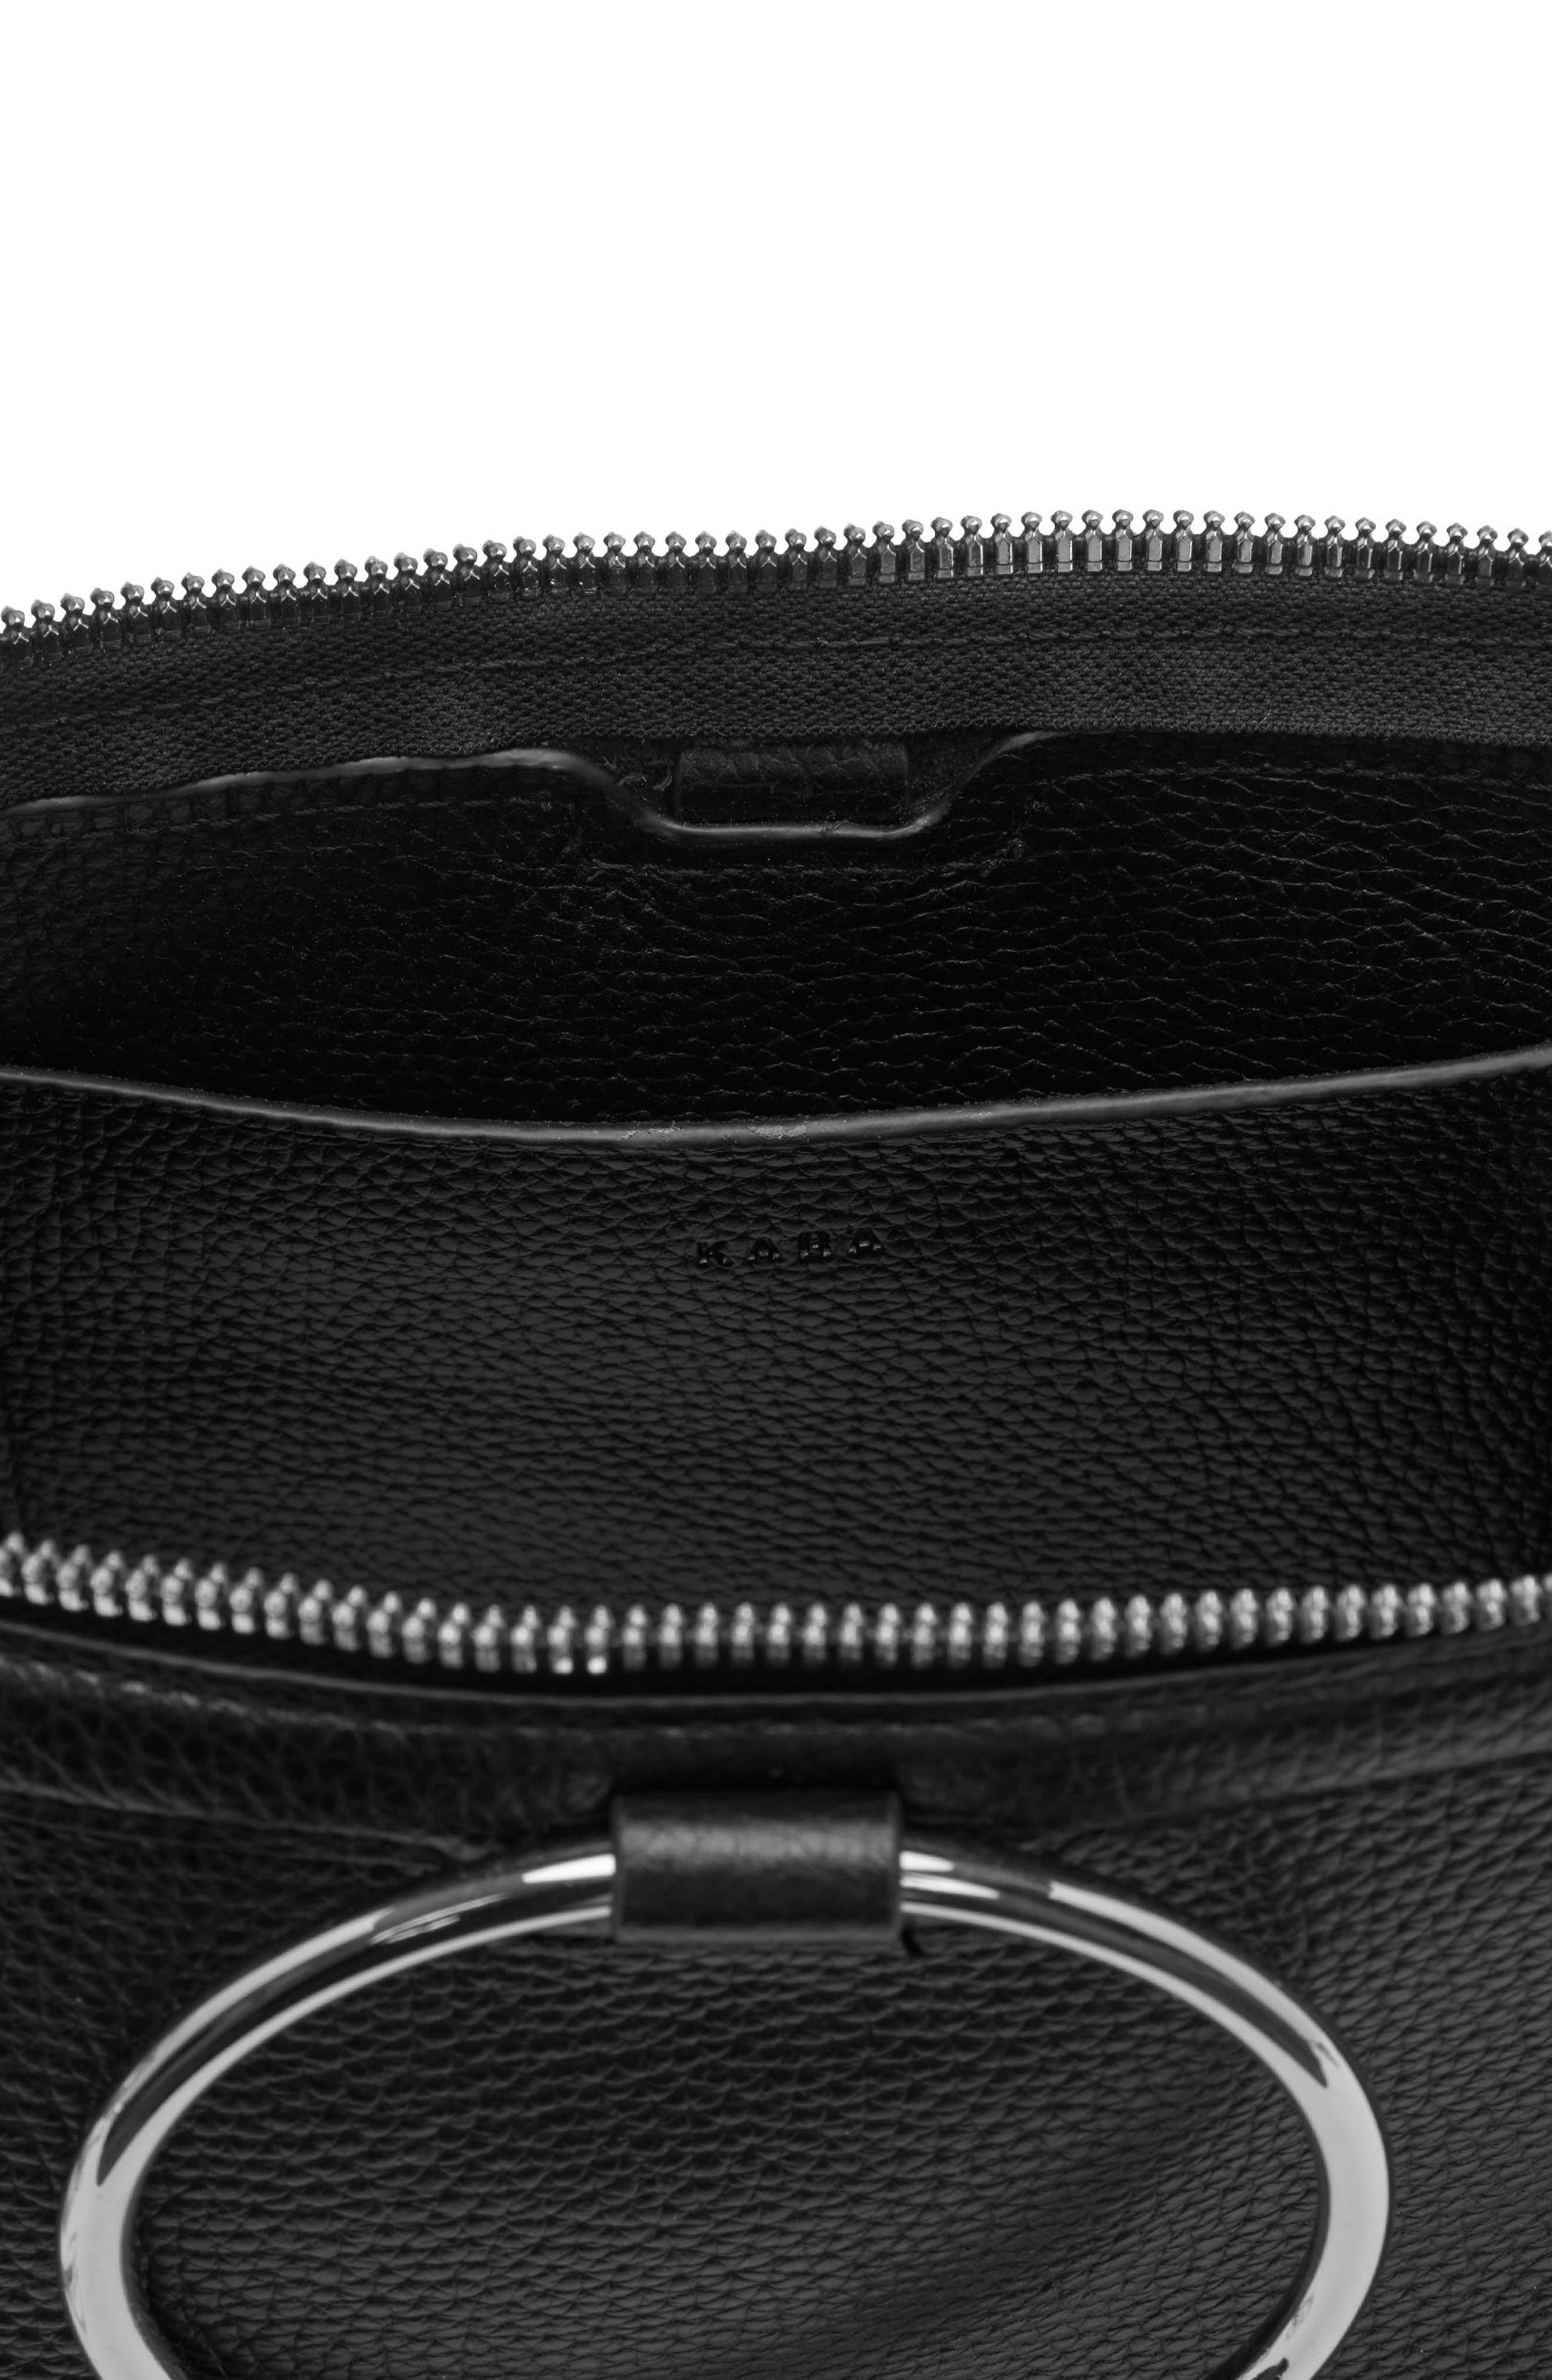 Alternate Image 4  - KARA Large Pebbled Leather Ring Clutch